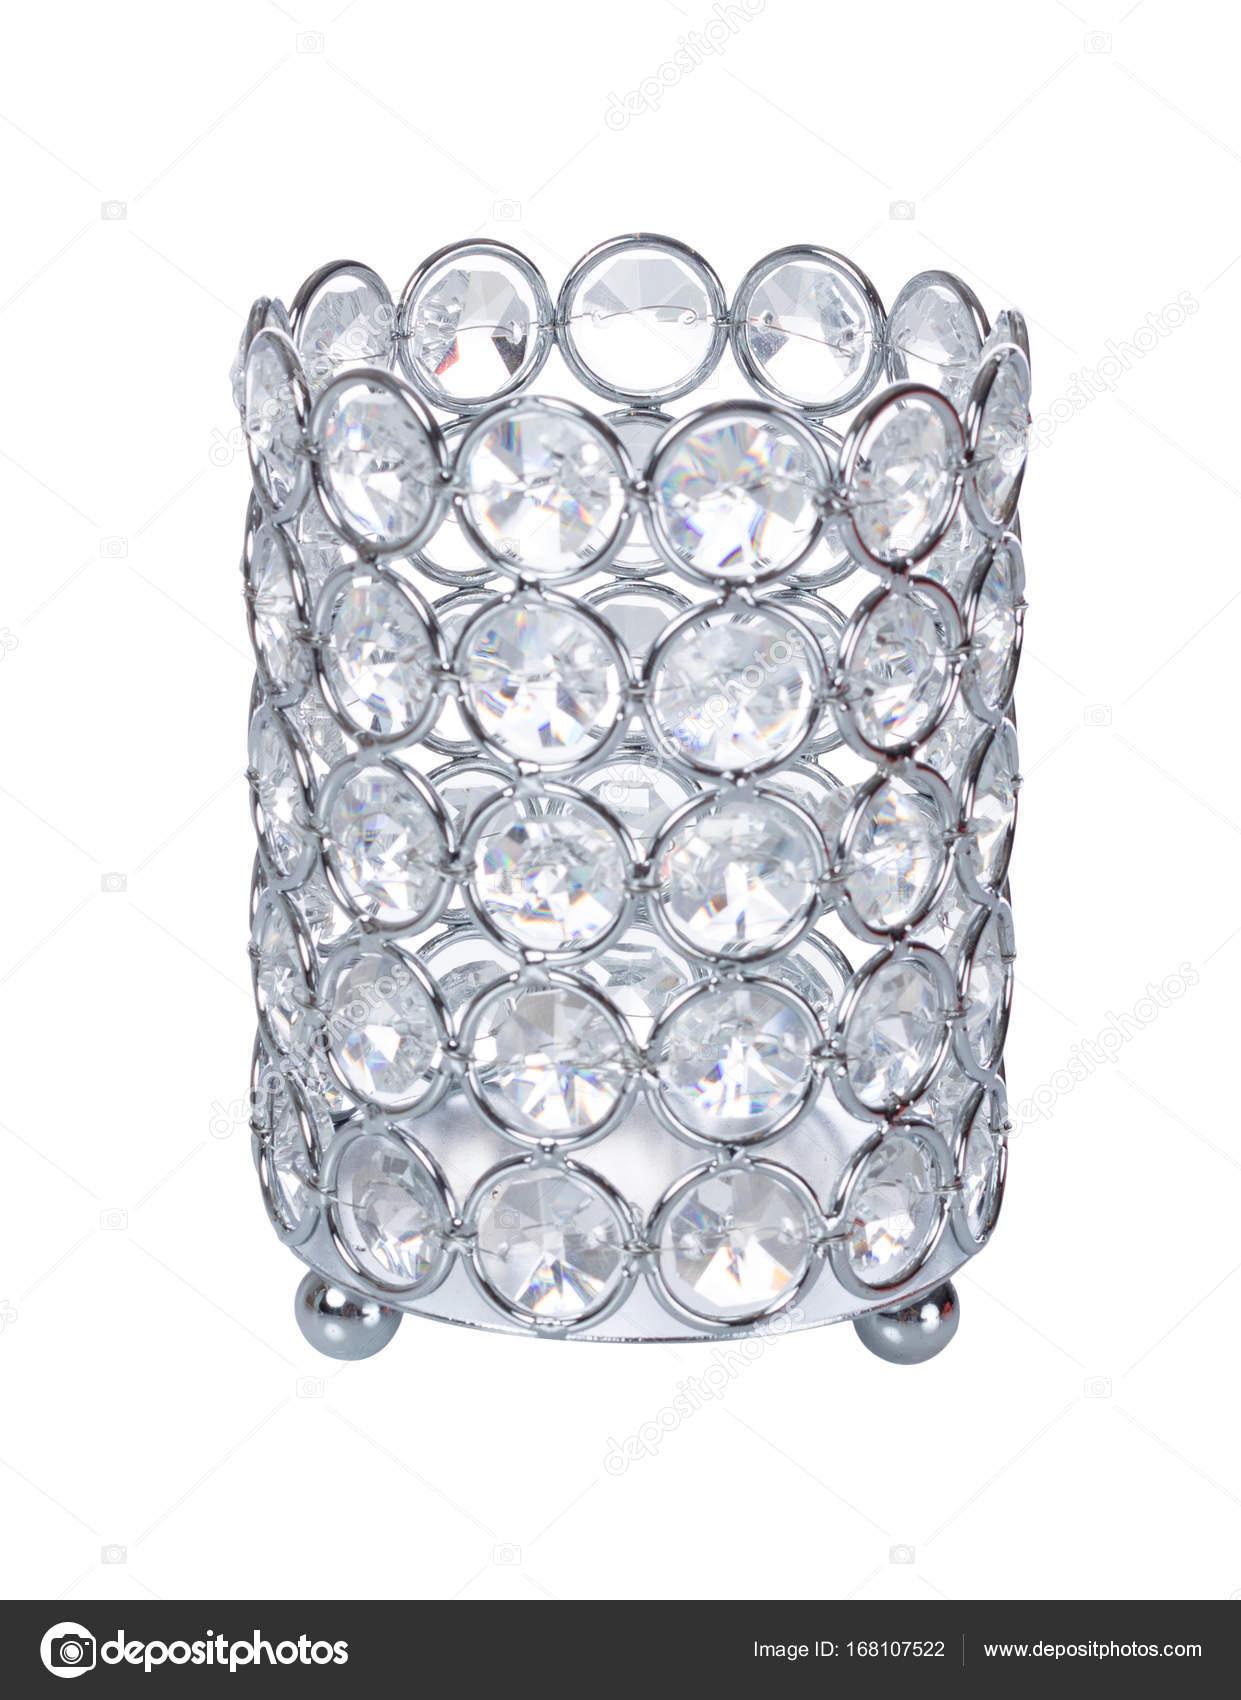 Beautiful luxury crystal vase with crystals isolated on white beautiful luxury crystal vase with crystals isolated on white background photo by miho666 reviewsmspy